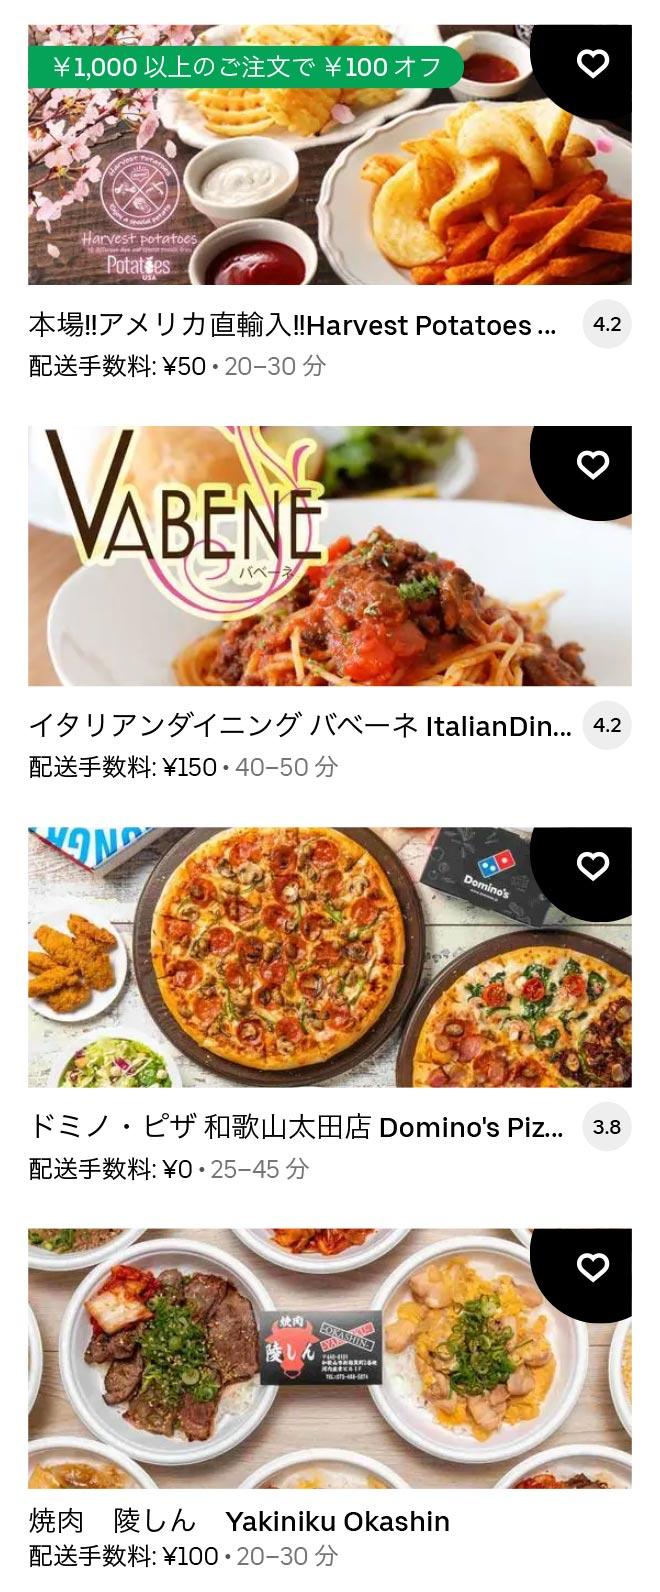 U wakayama menu 2104 05